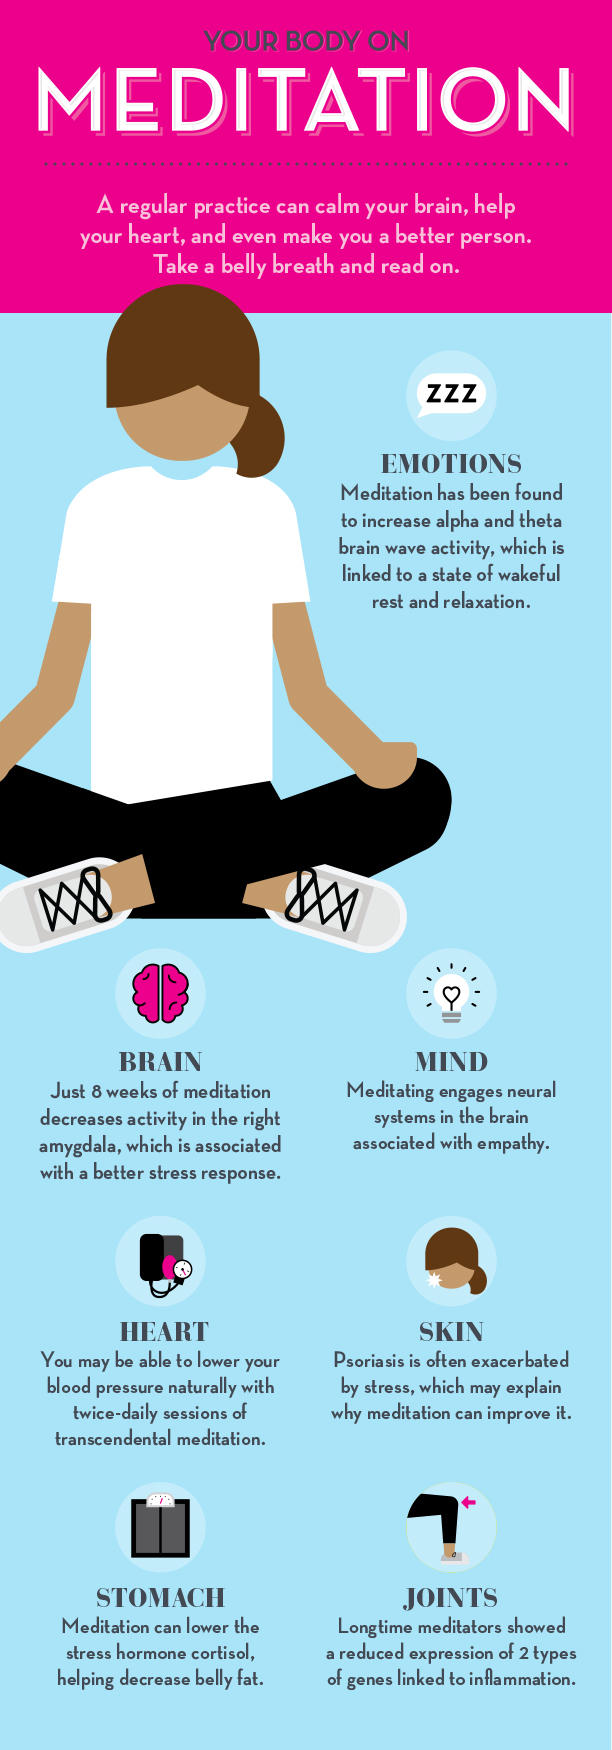 prevention_meditation_3_0.jpg